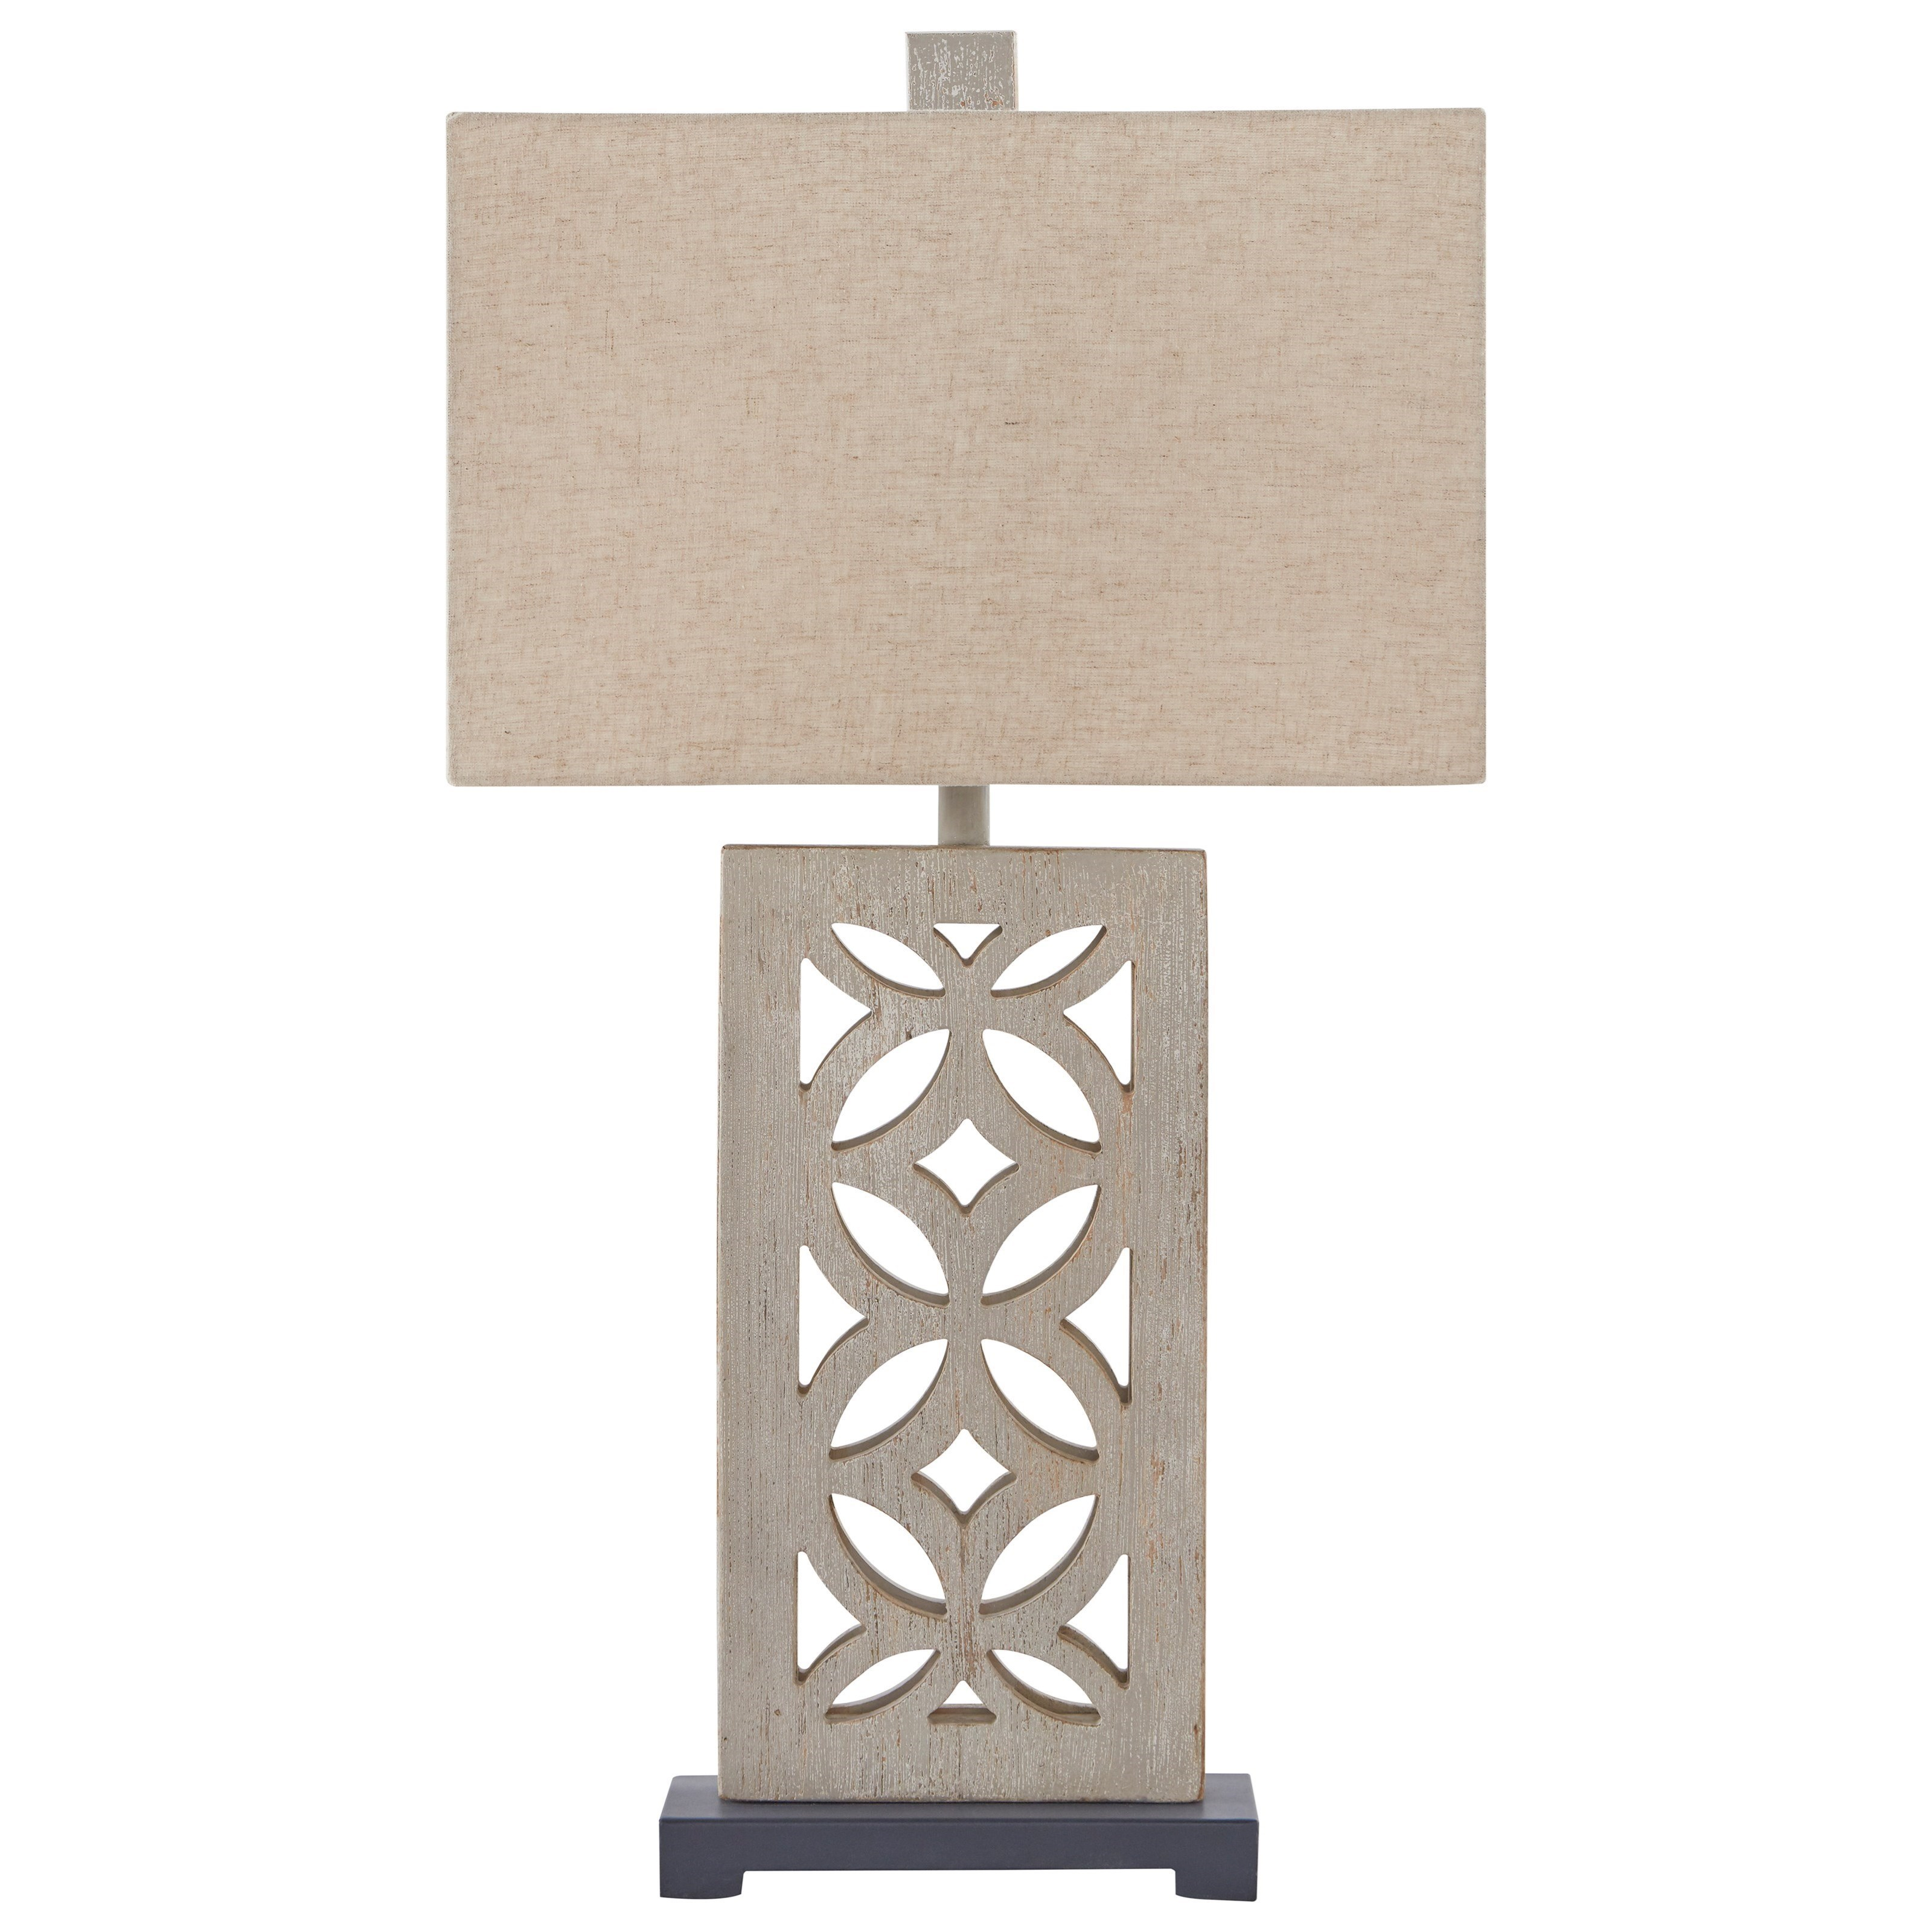 Mairwen Antique Gray Wood Table Lamp